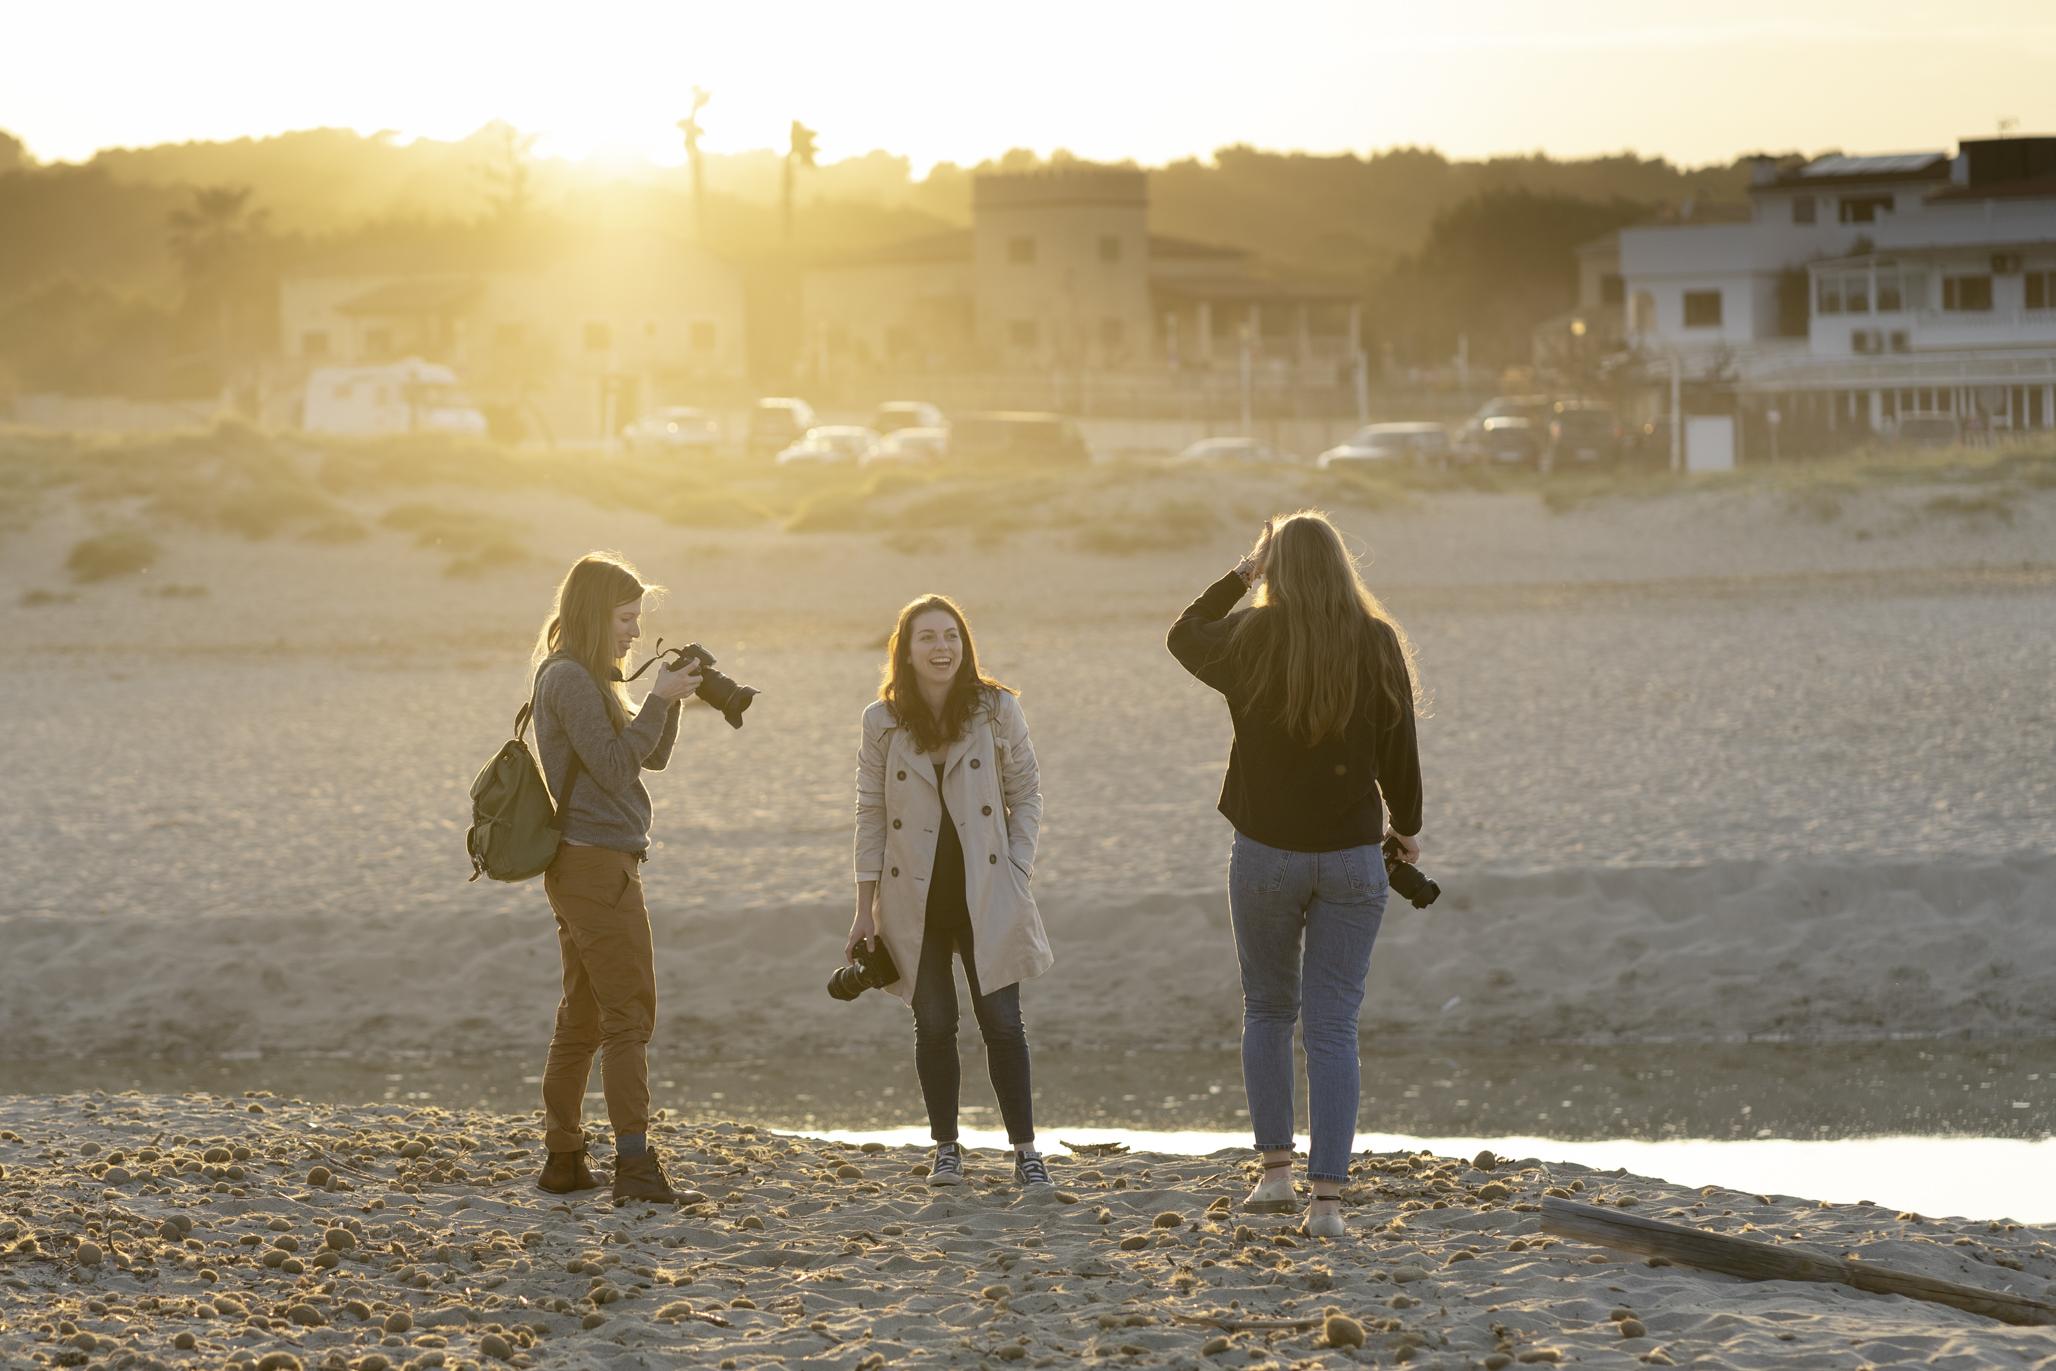 LIK Akademie Schüler bei den Medienprojekttagen auf Mallorca. Foto: Iris Höller